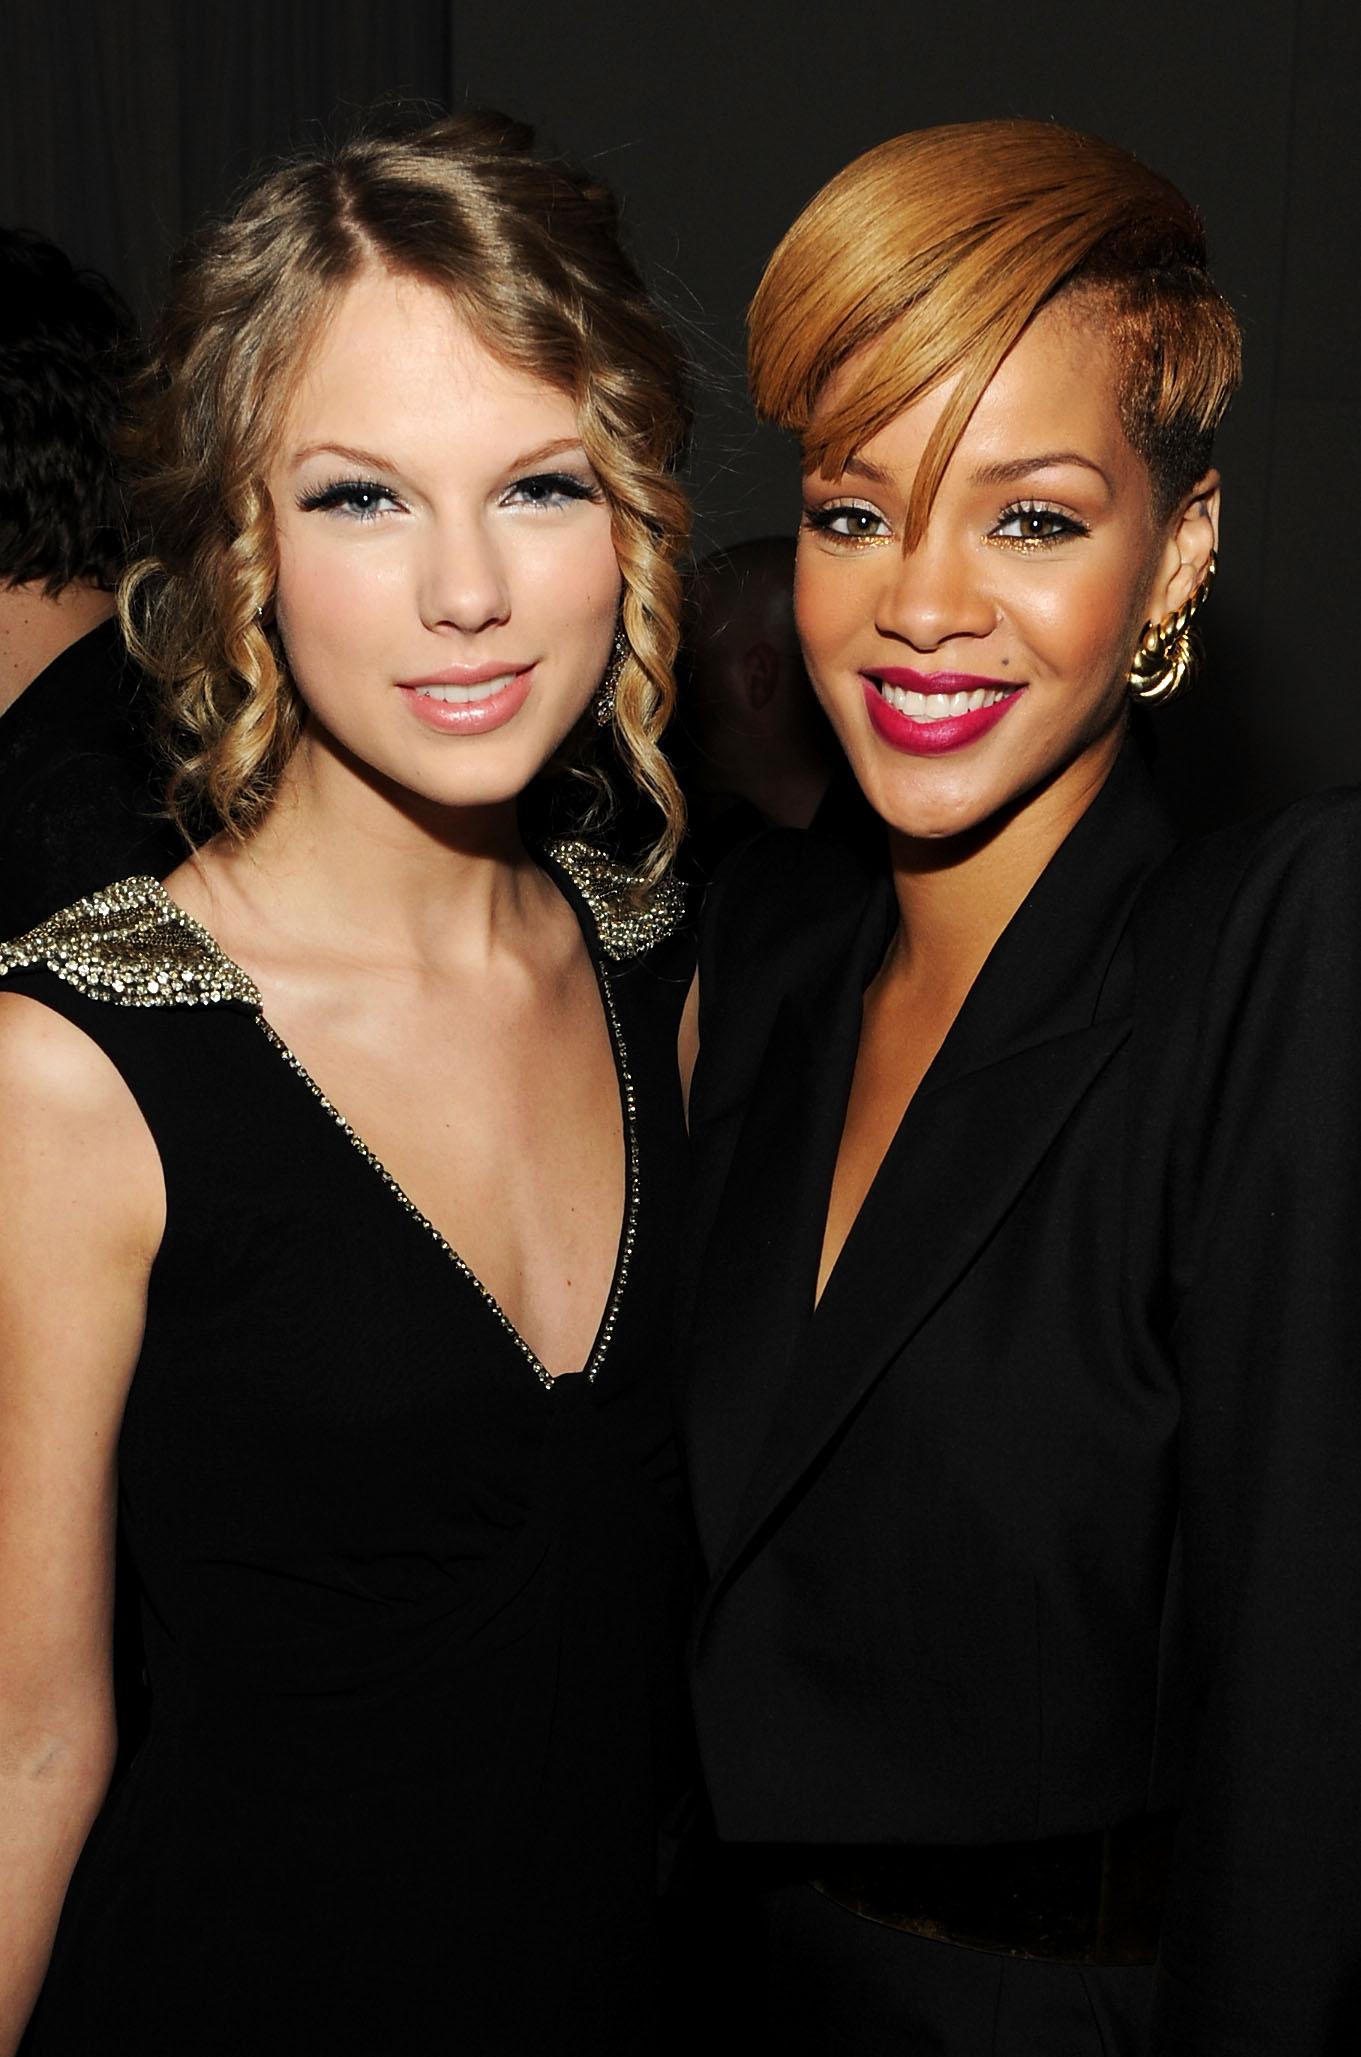 Taylor Swift & Rihanna at the VEVO Launches Premie